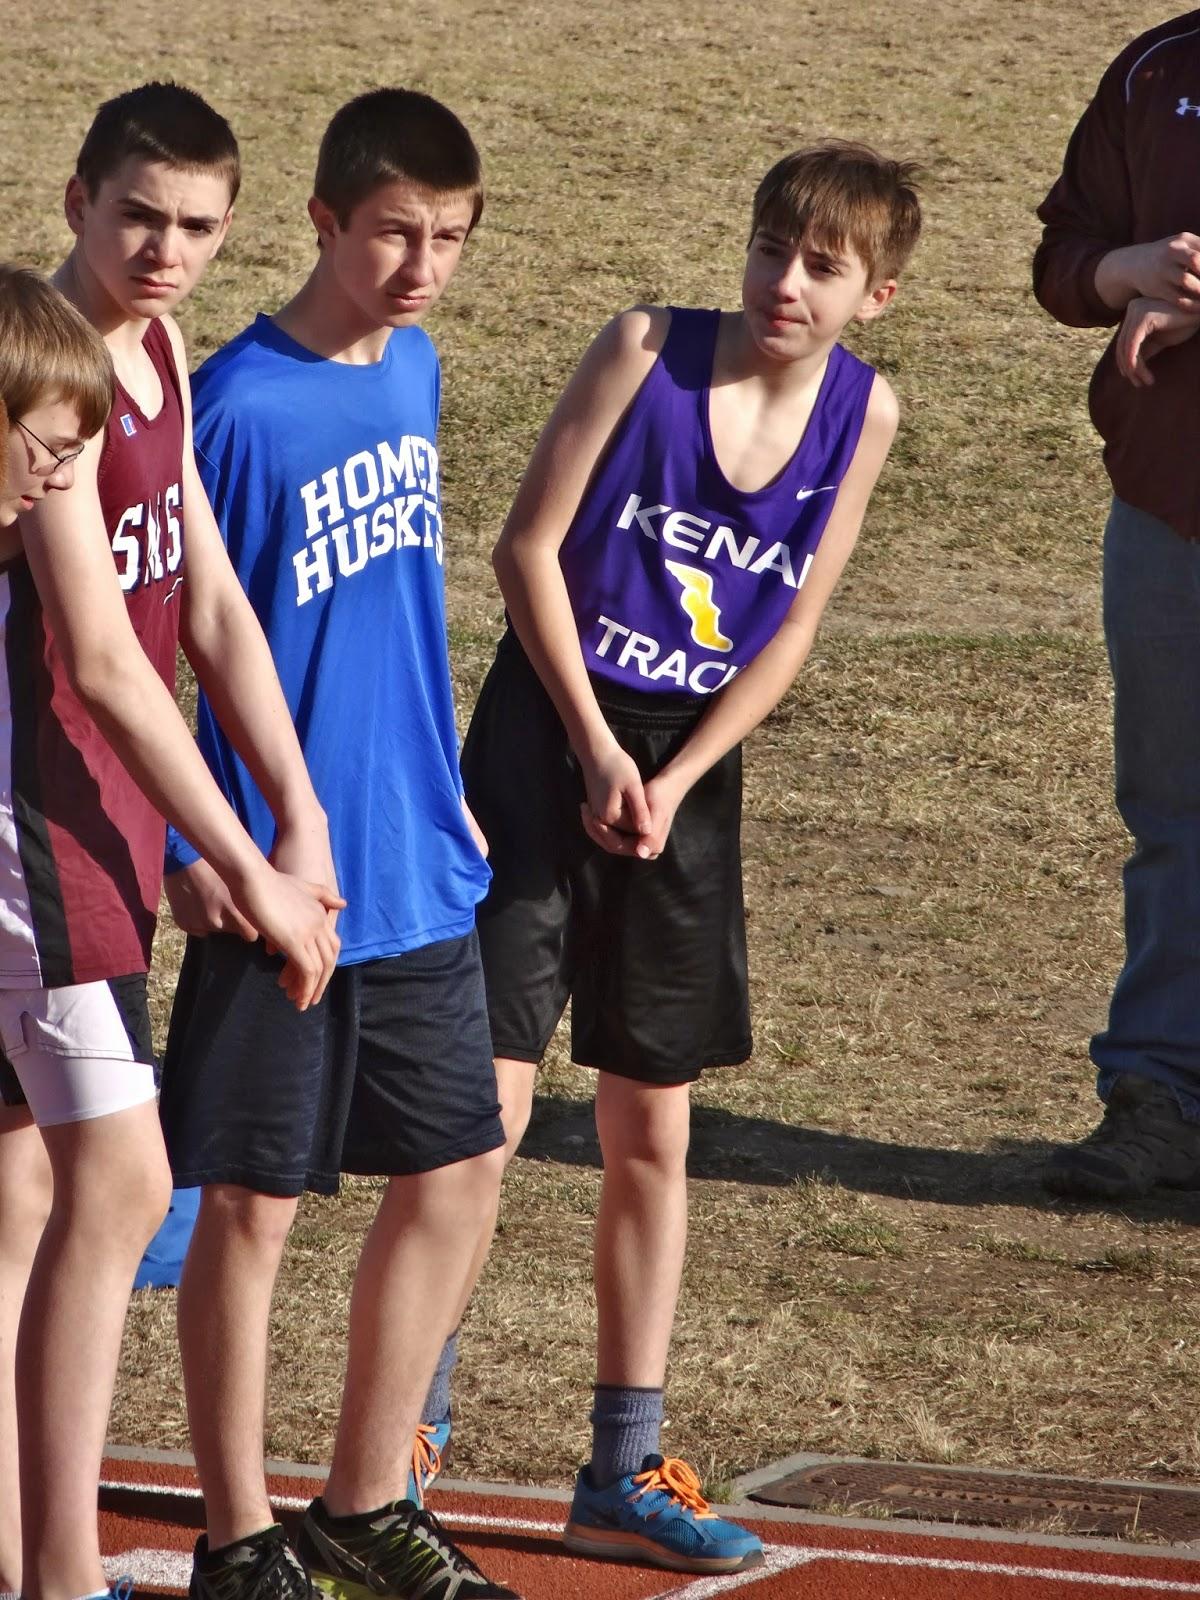 bloom carroll middle school track meet